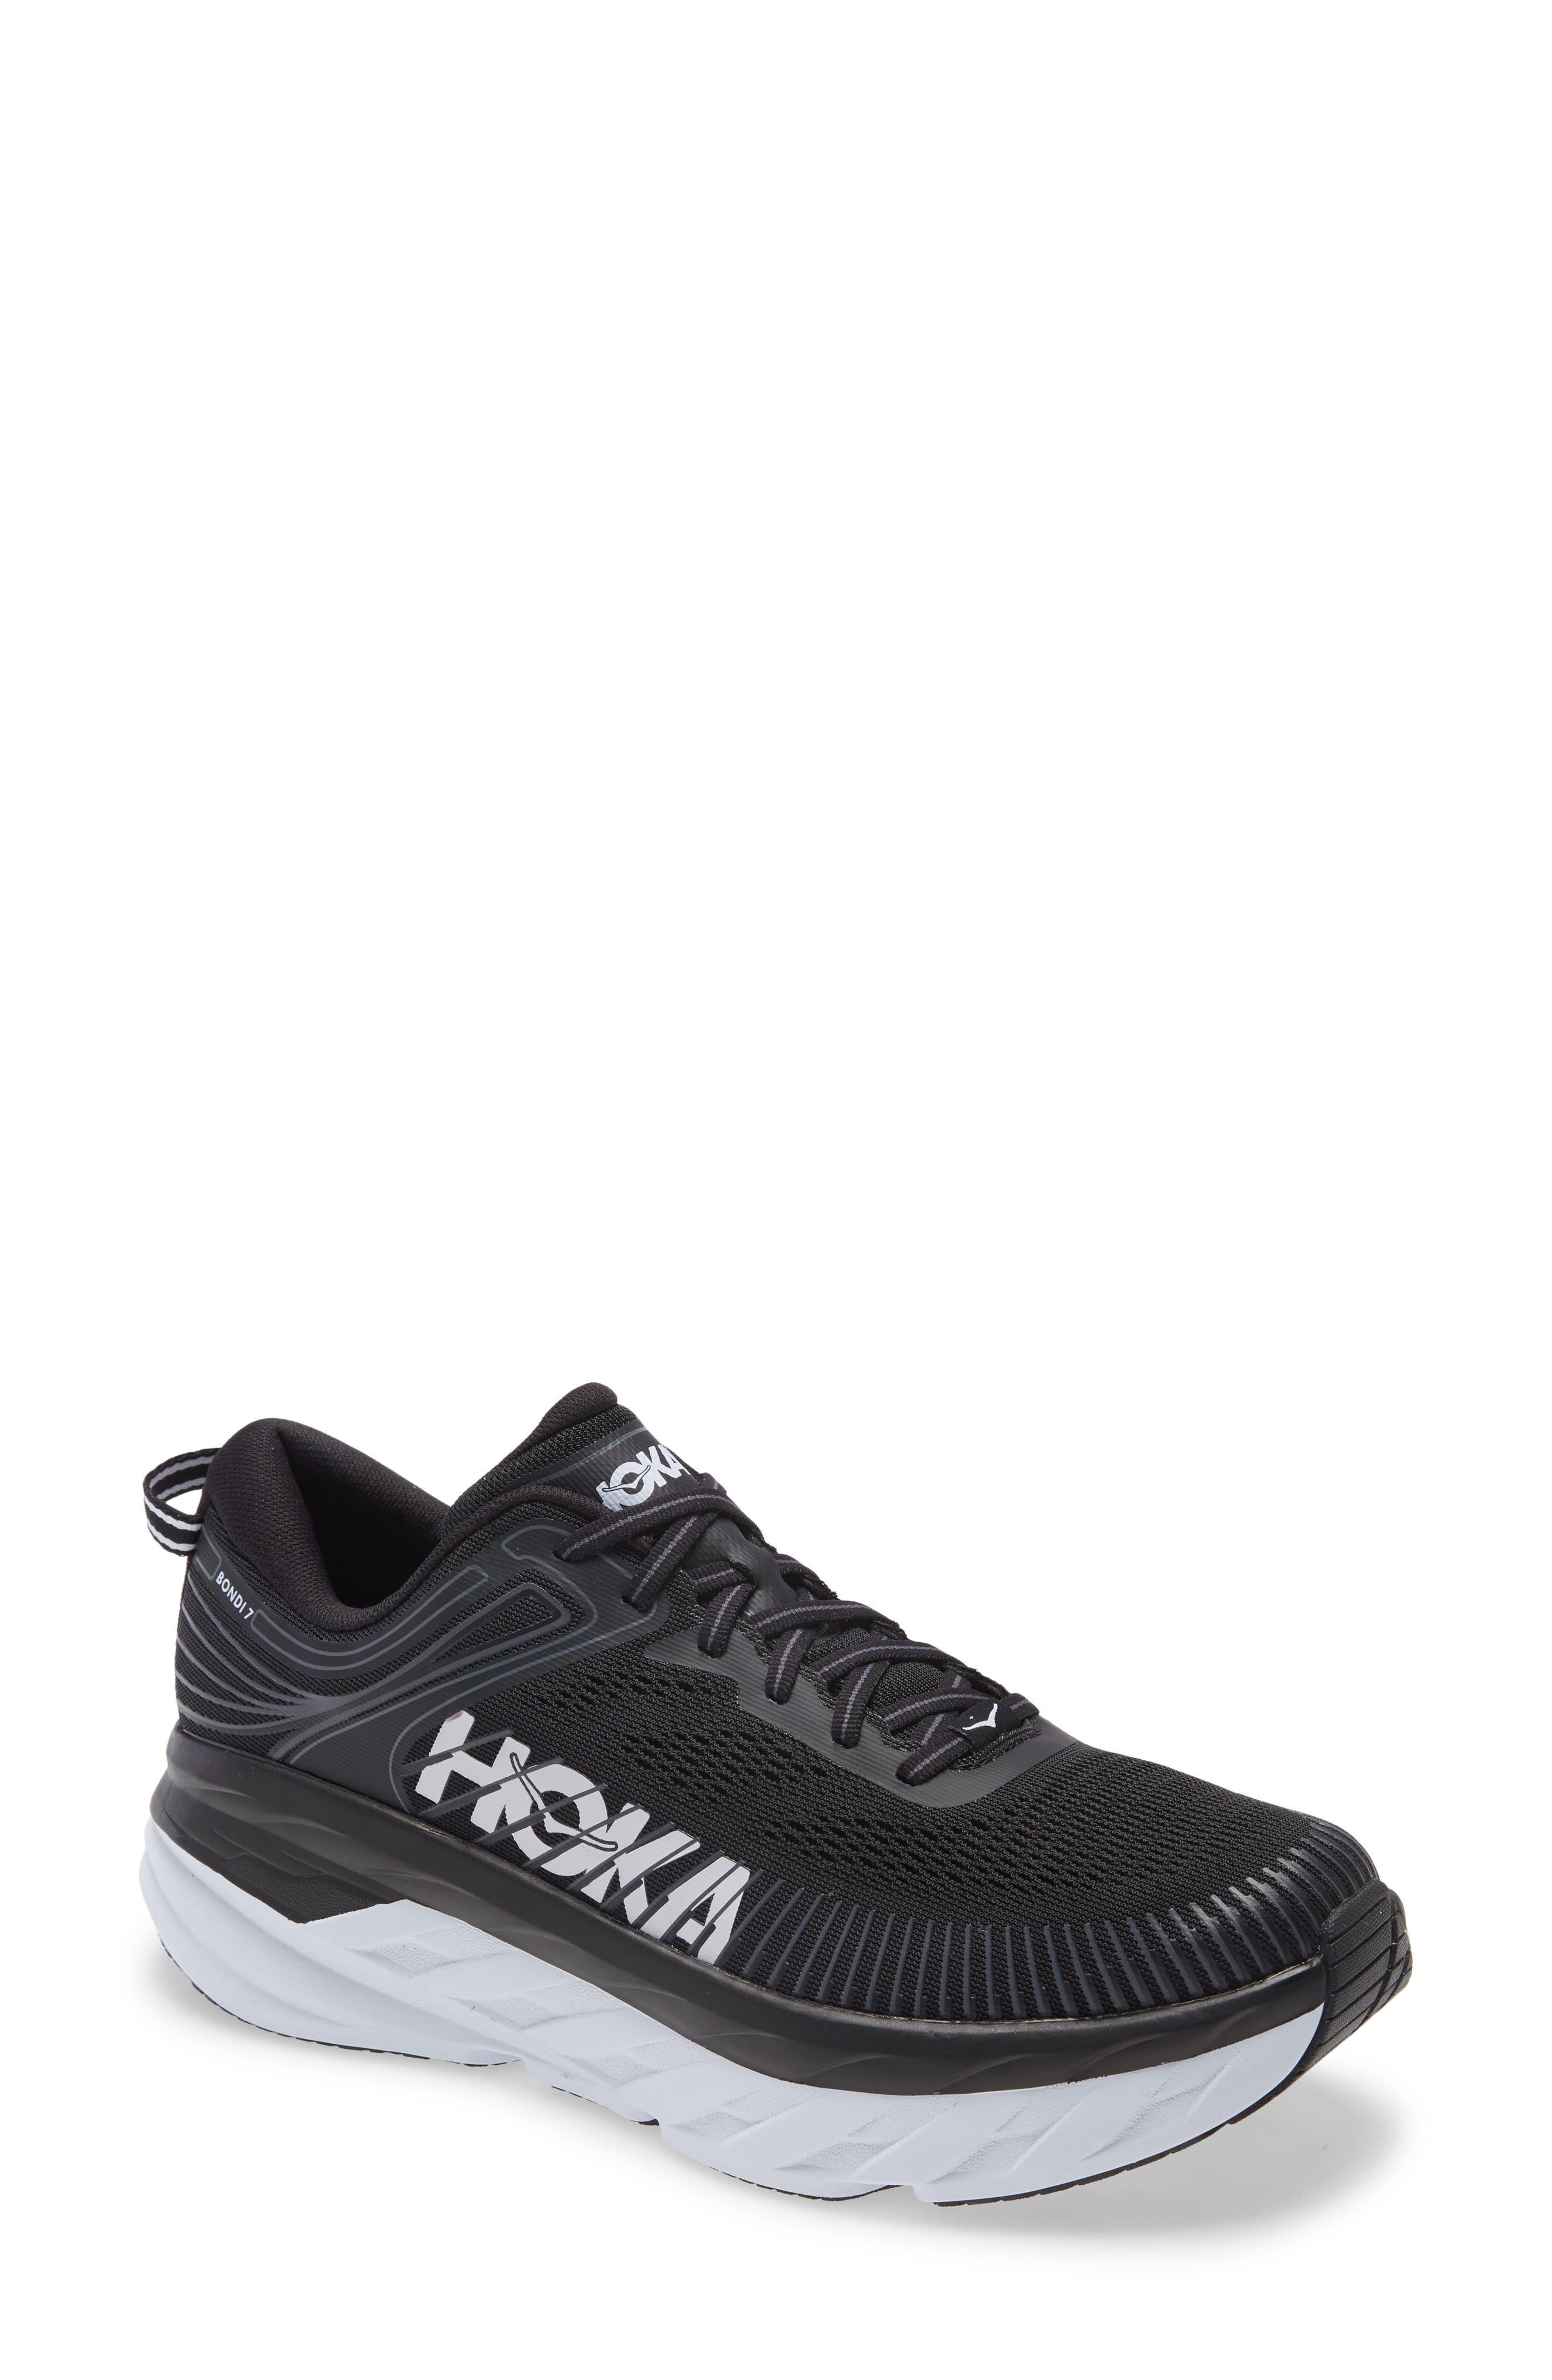 Bondi 7 Running Shoe